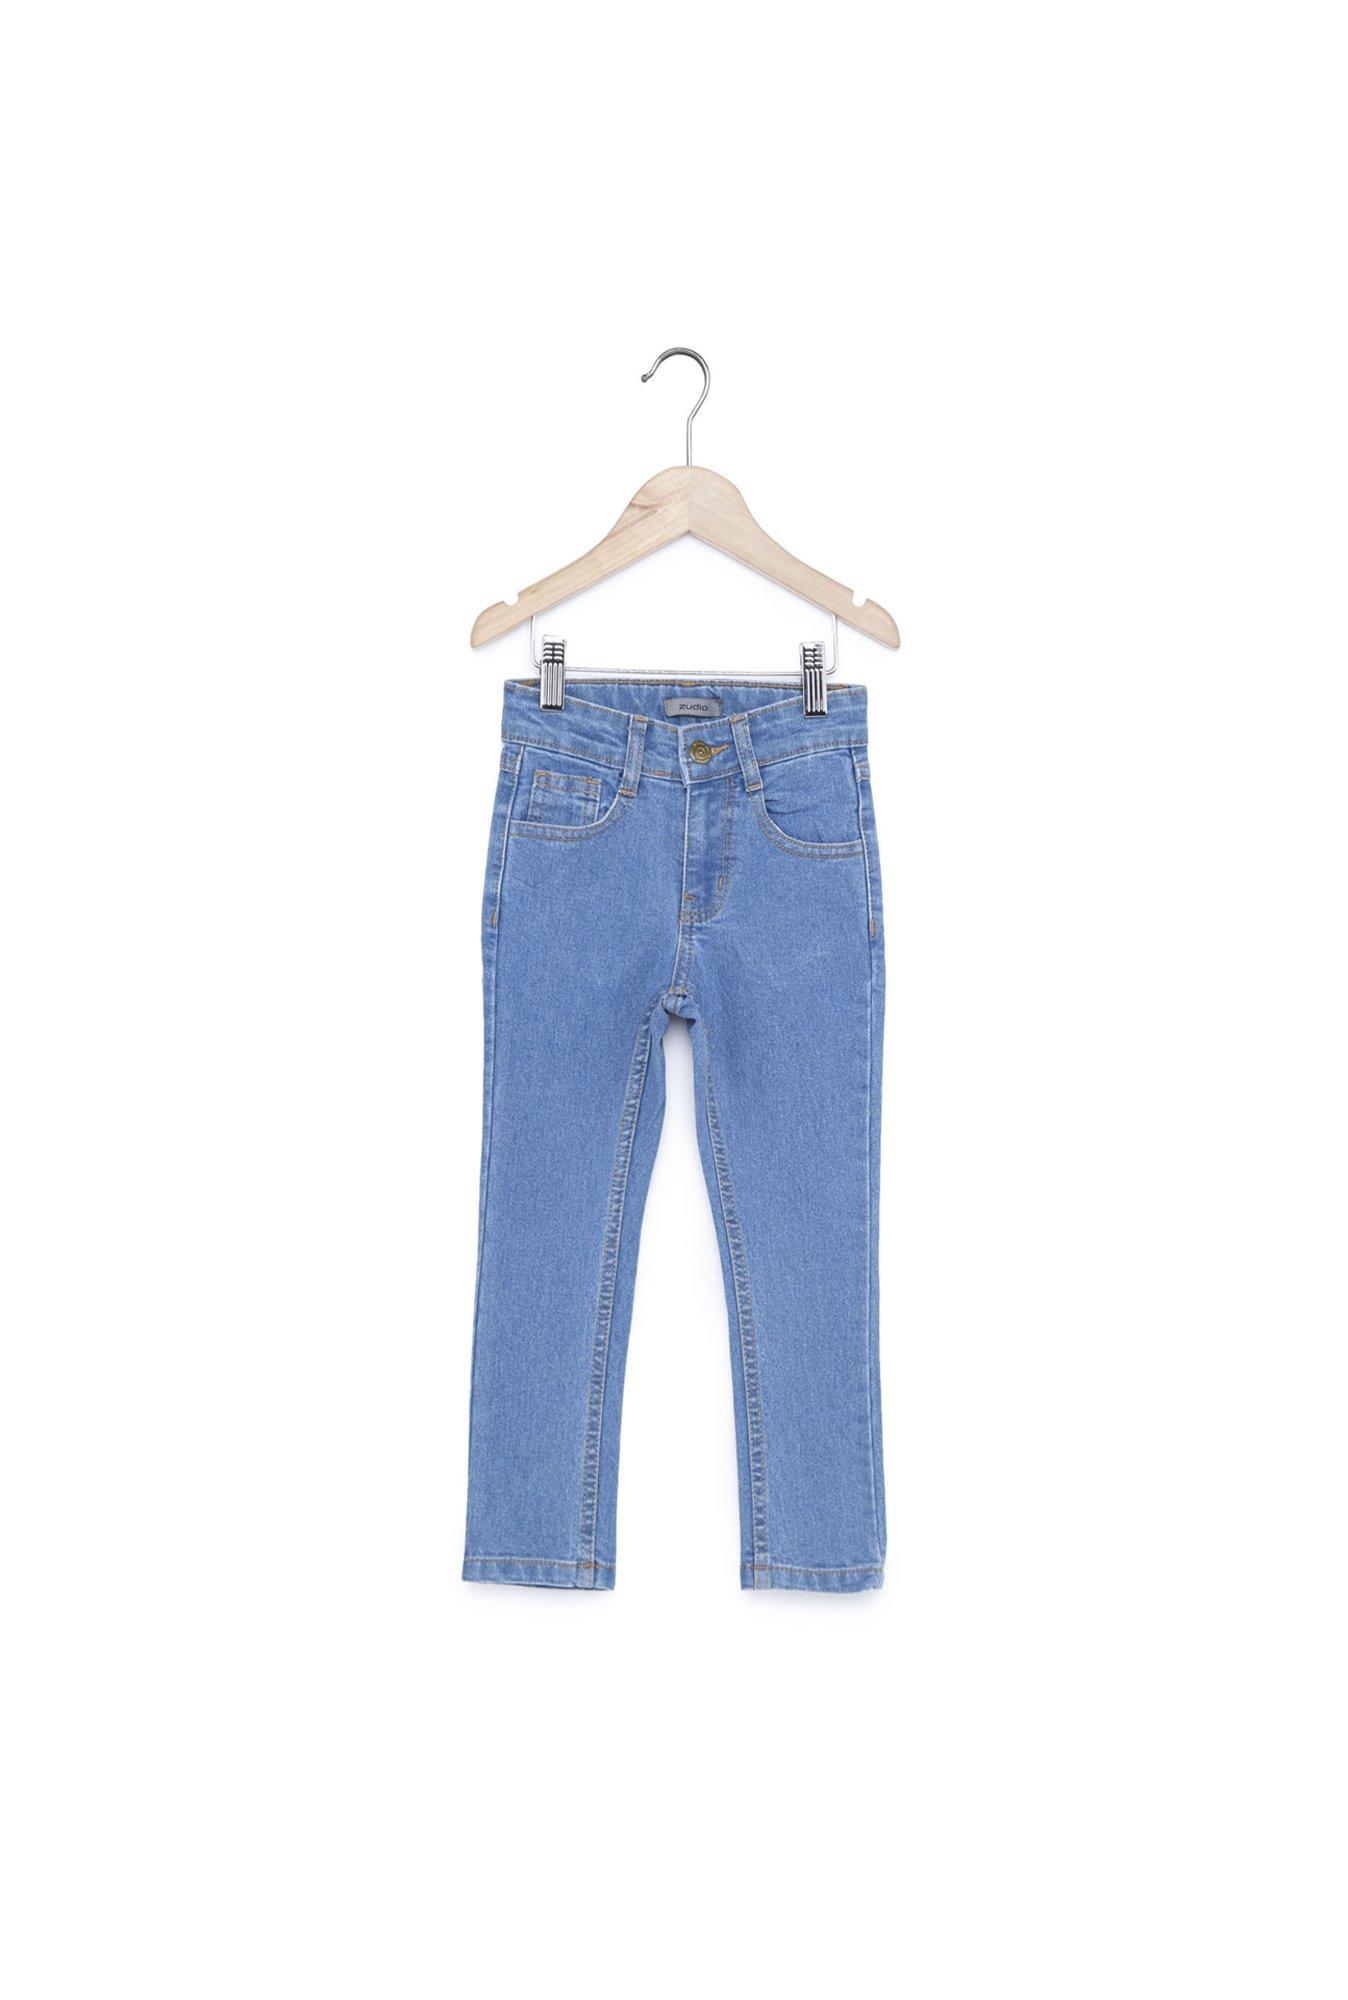 Zudio Blue Jeans